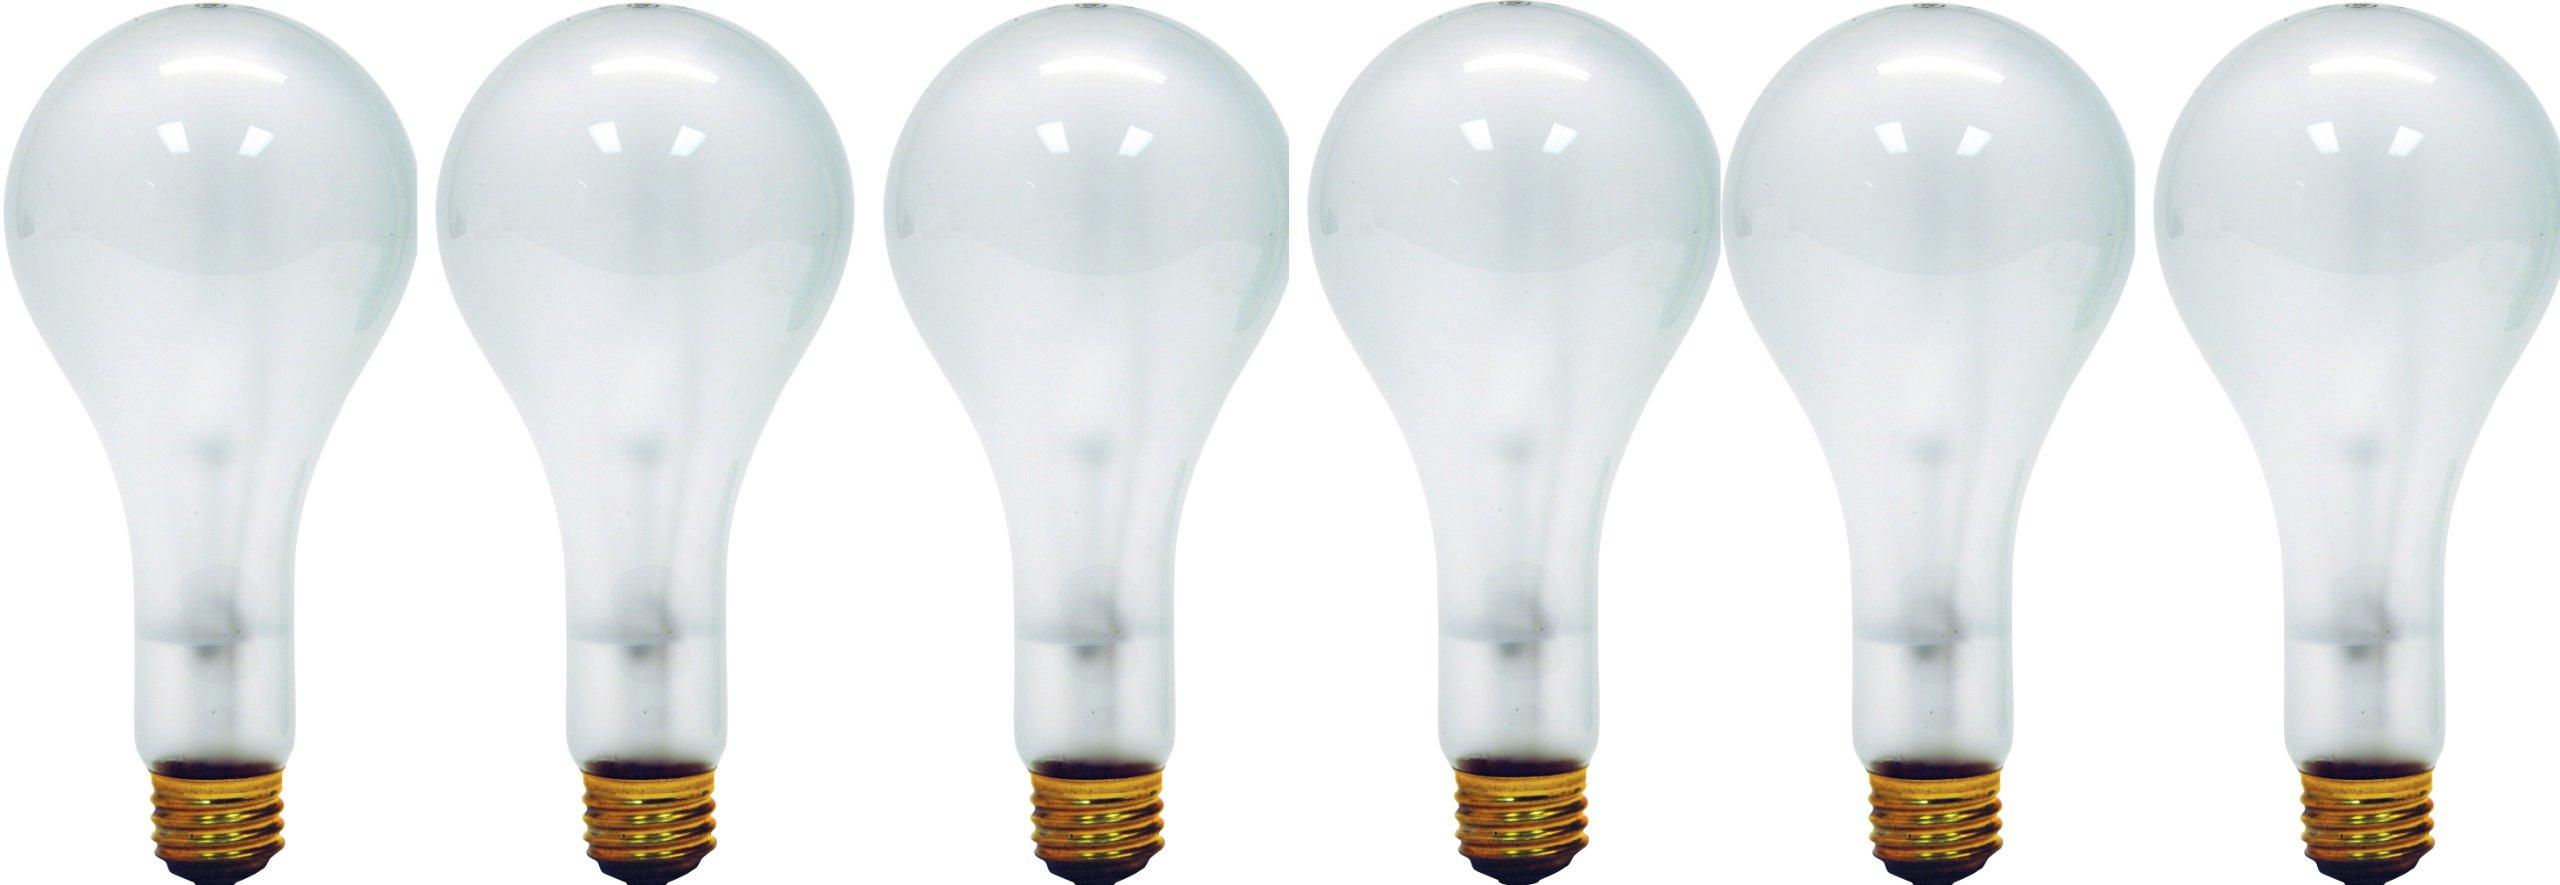 GE Lighting 41459-6 Soft White 3-Way Mogul Base Bulb, 100/200/300-Watt 6-Pack